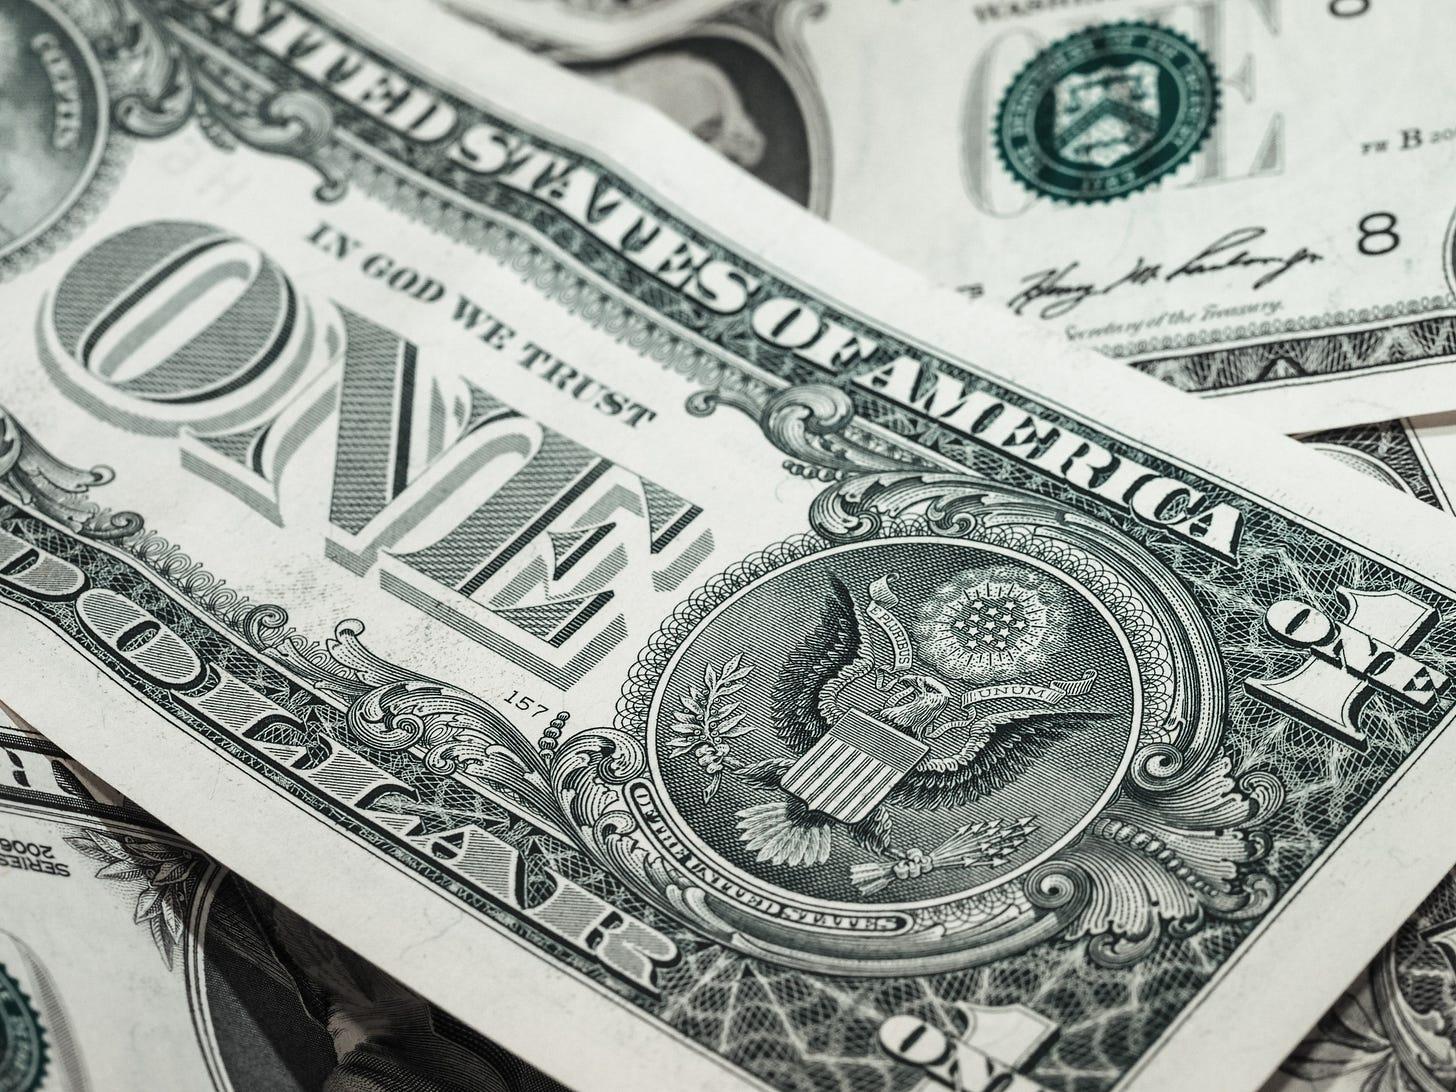 A loose pile of dollar bills, viewed up close